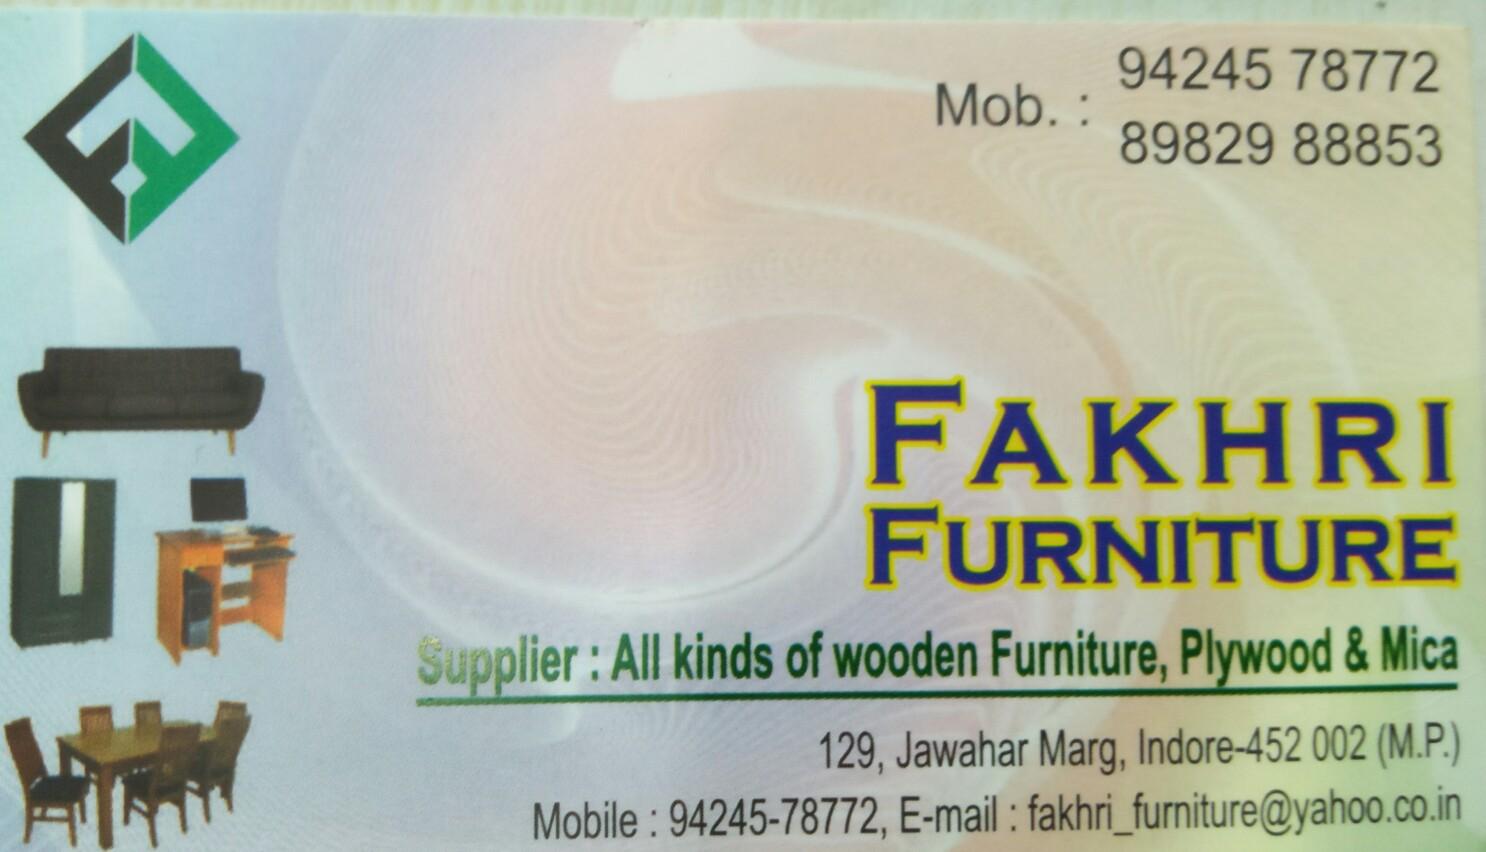 Fakhri Furniture